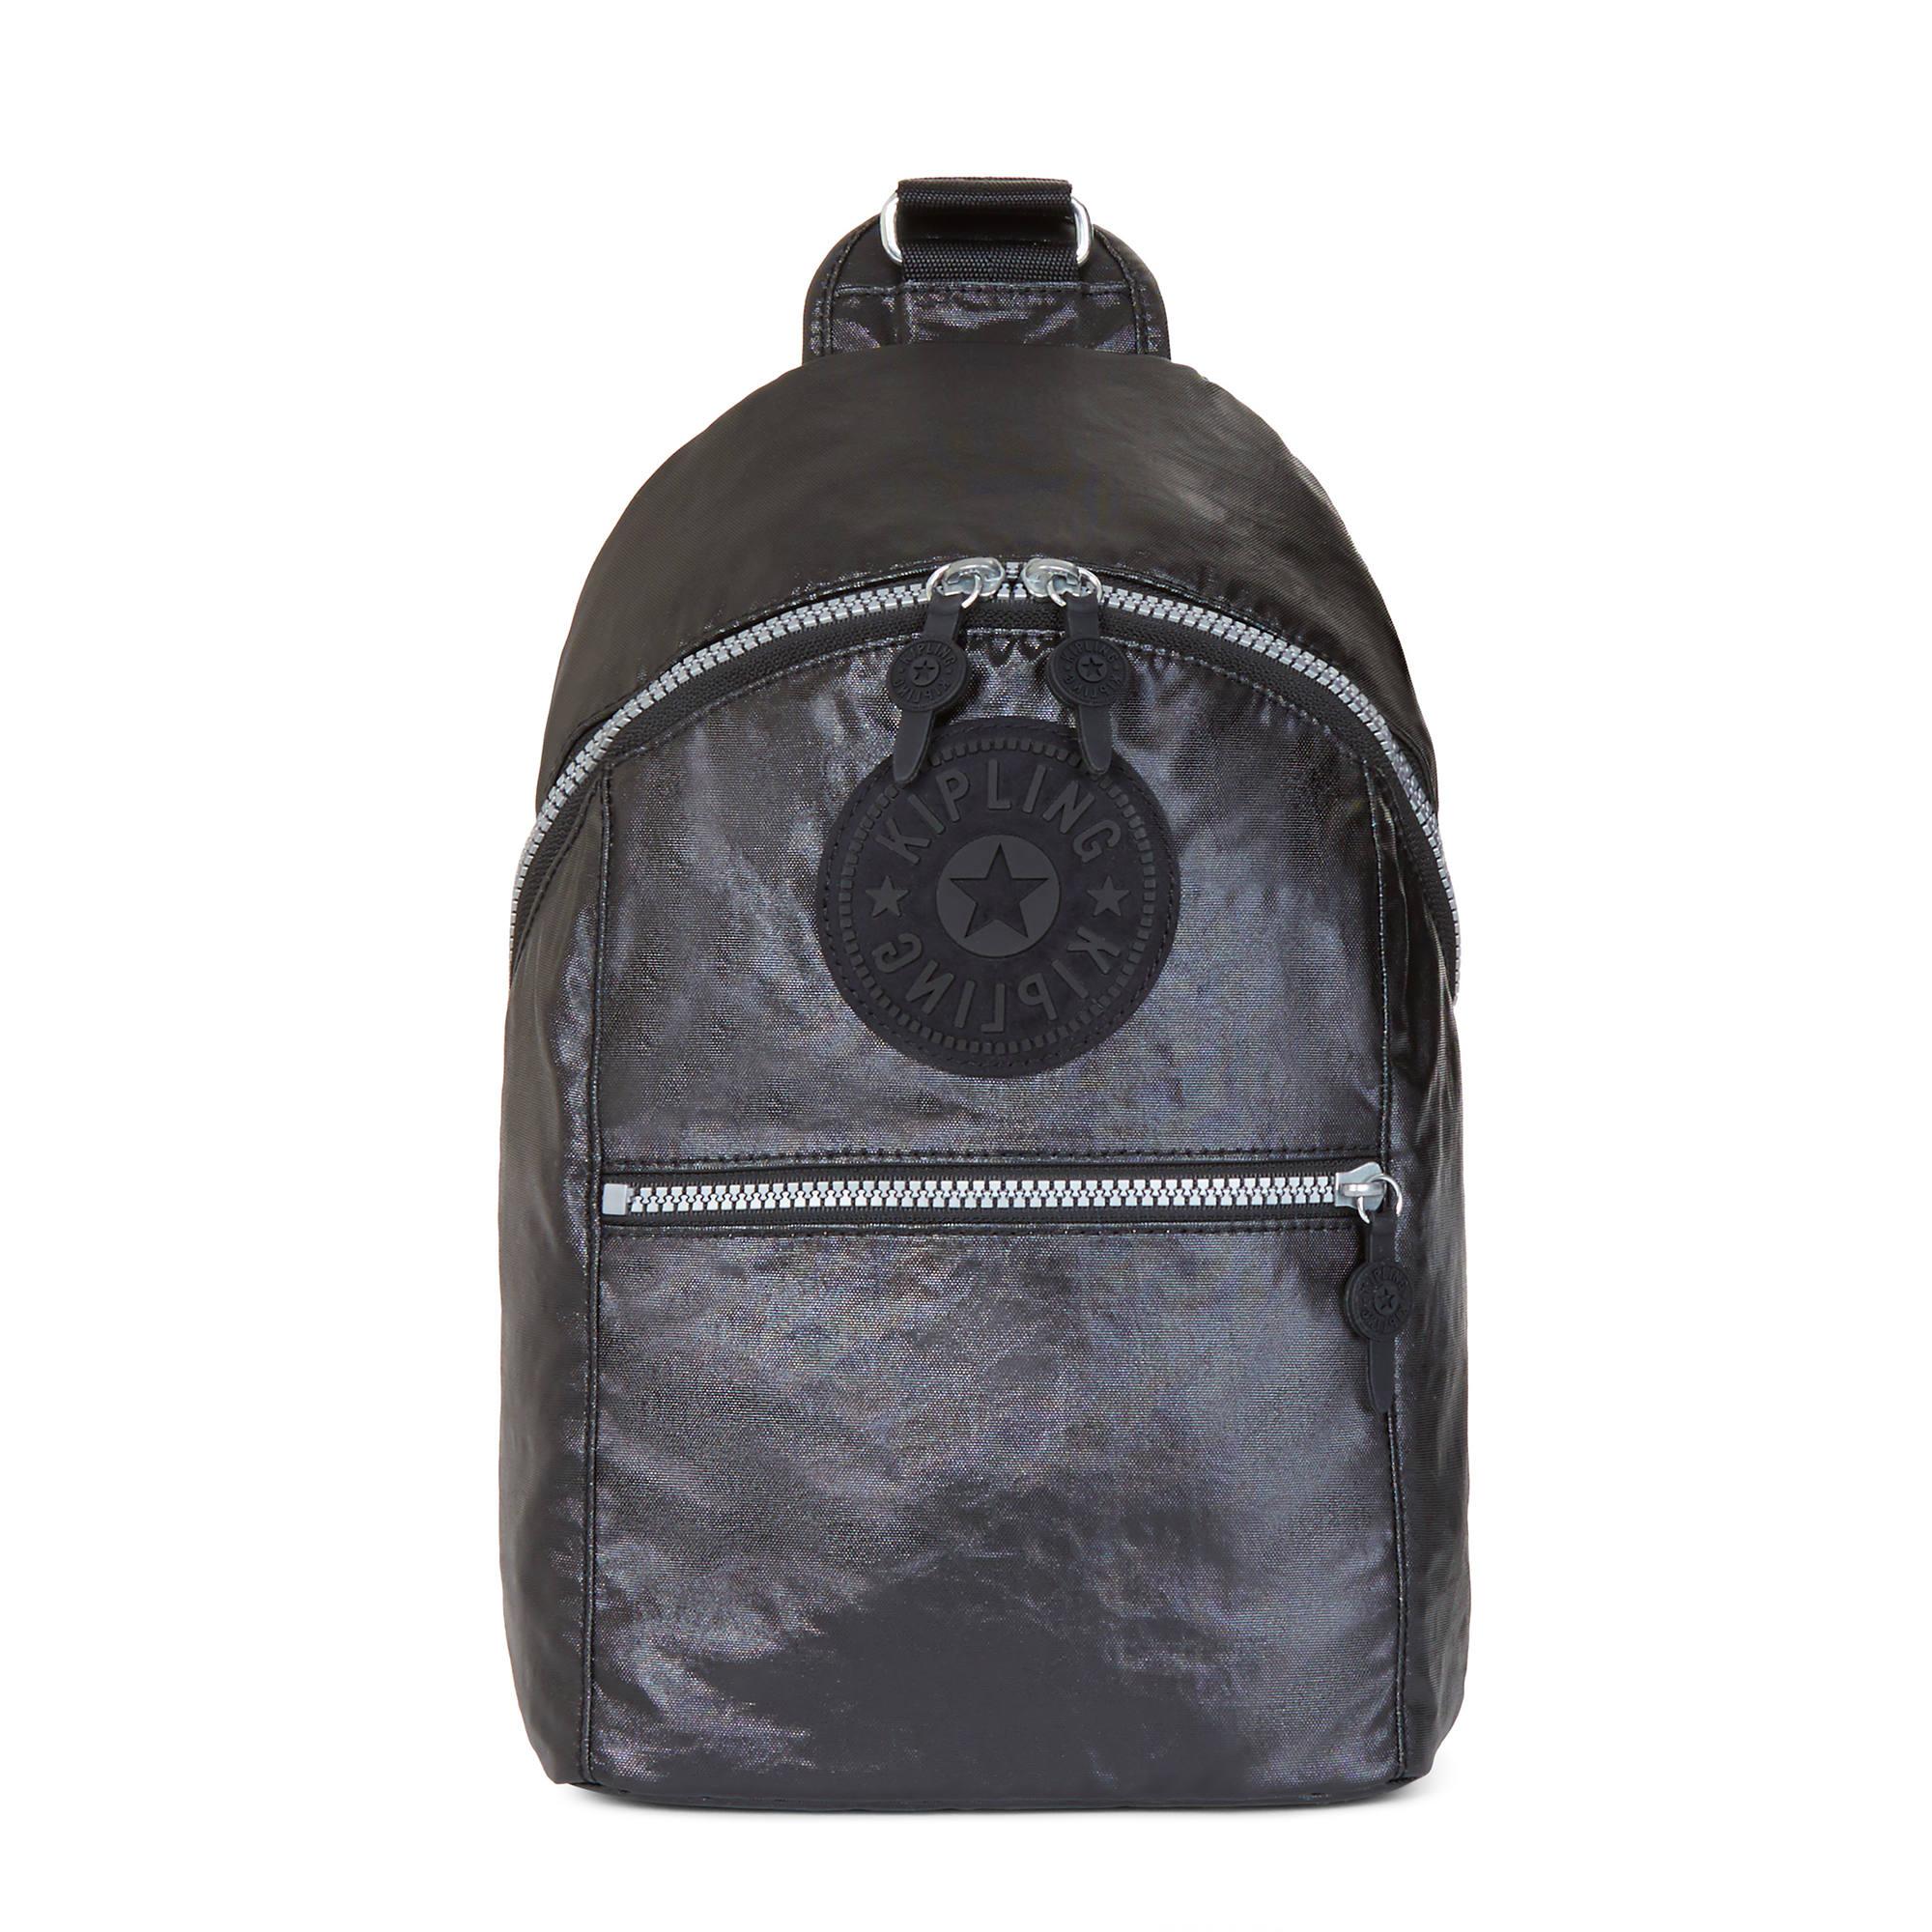 e4c019e0ac Bente Metallic Backpack,Lacquer Black,large